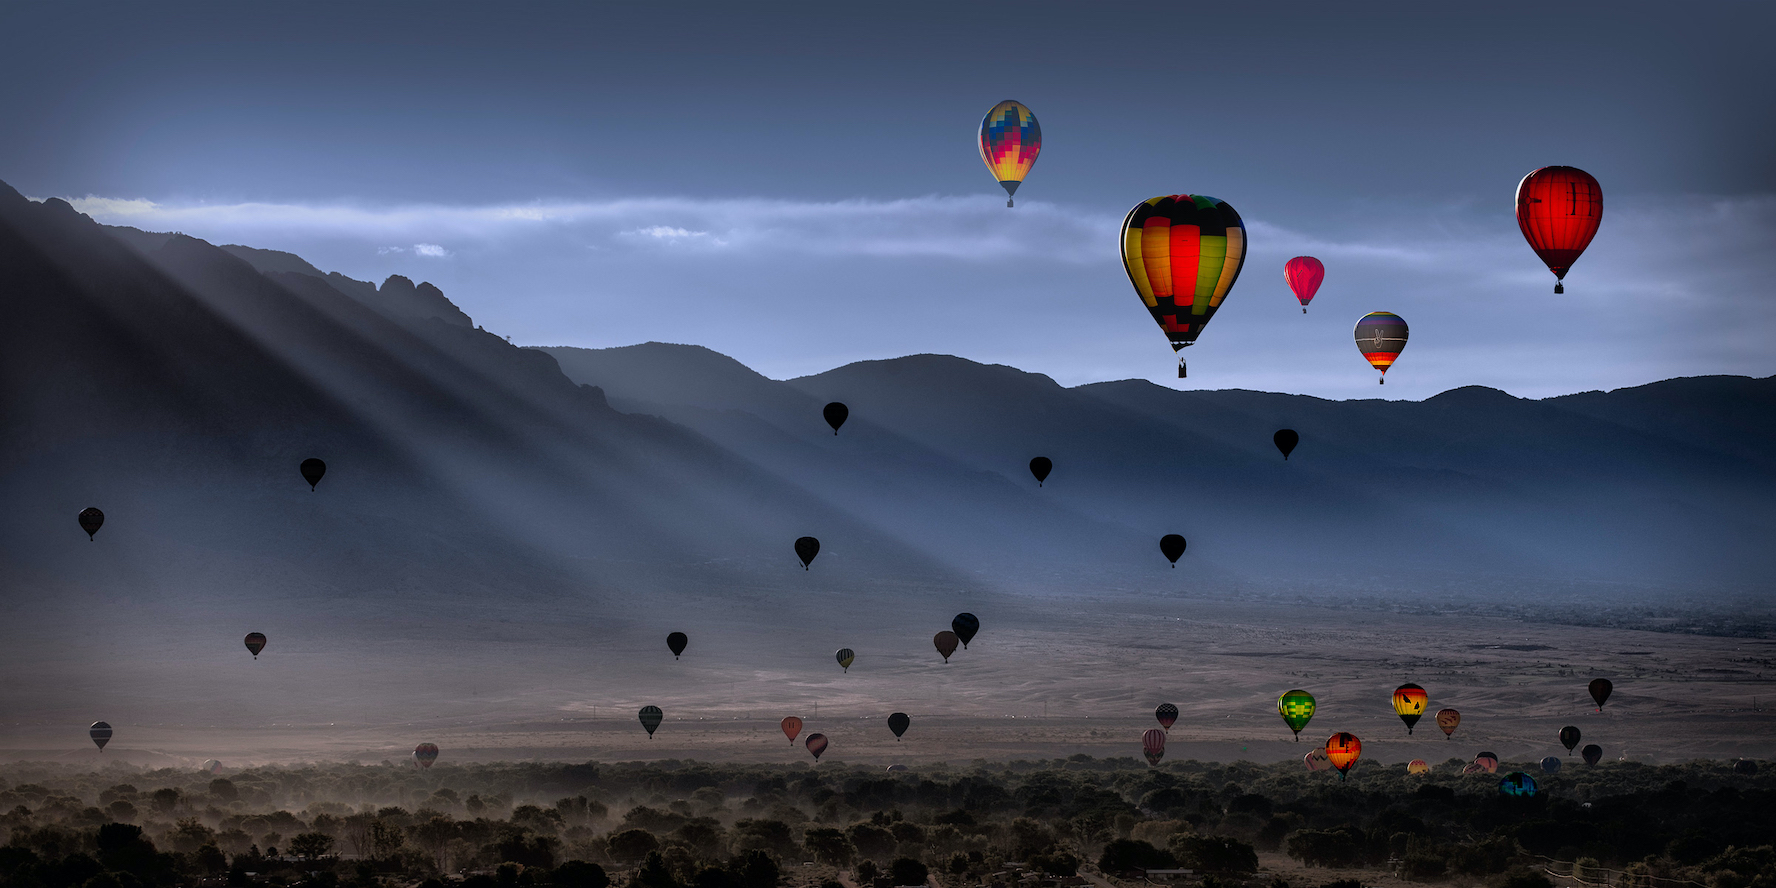 Dennis Chamberlain: Balloon Fiesta Morning II